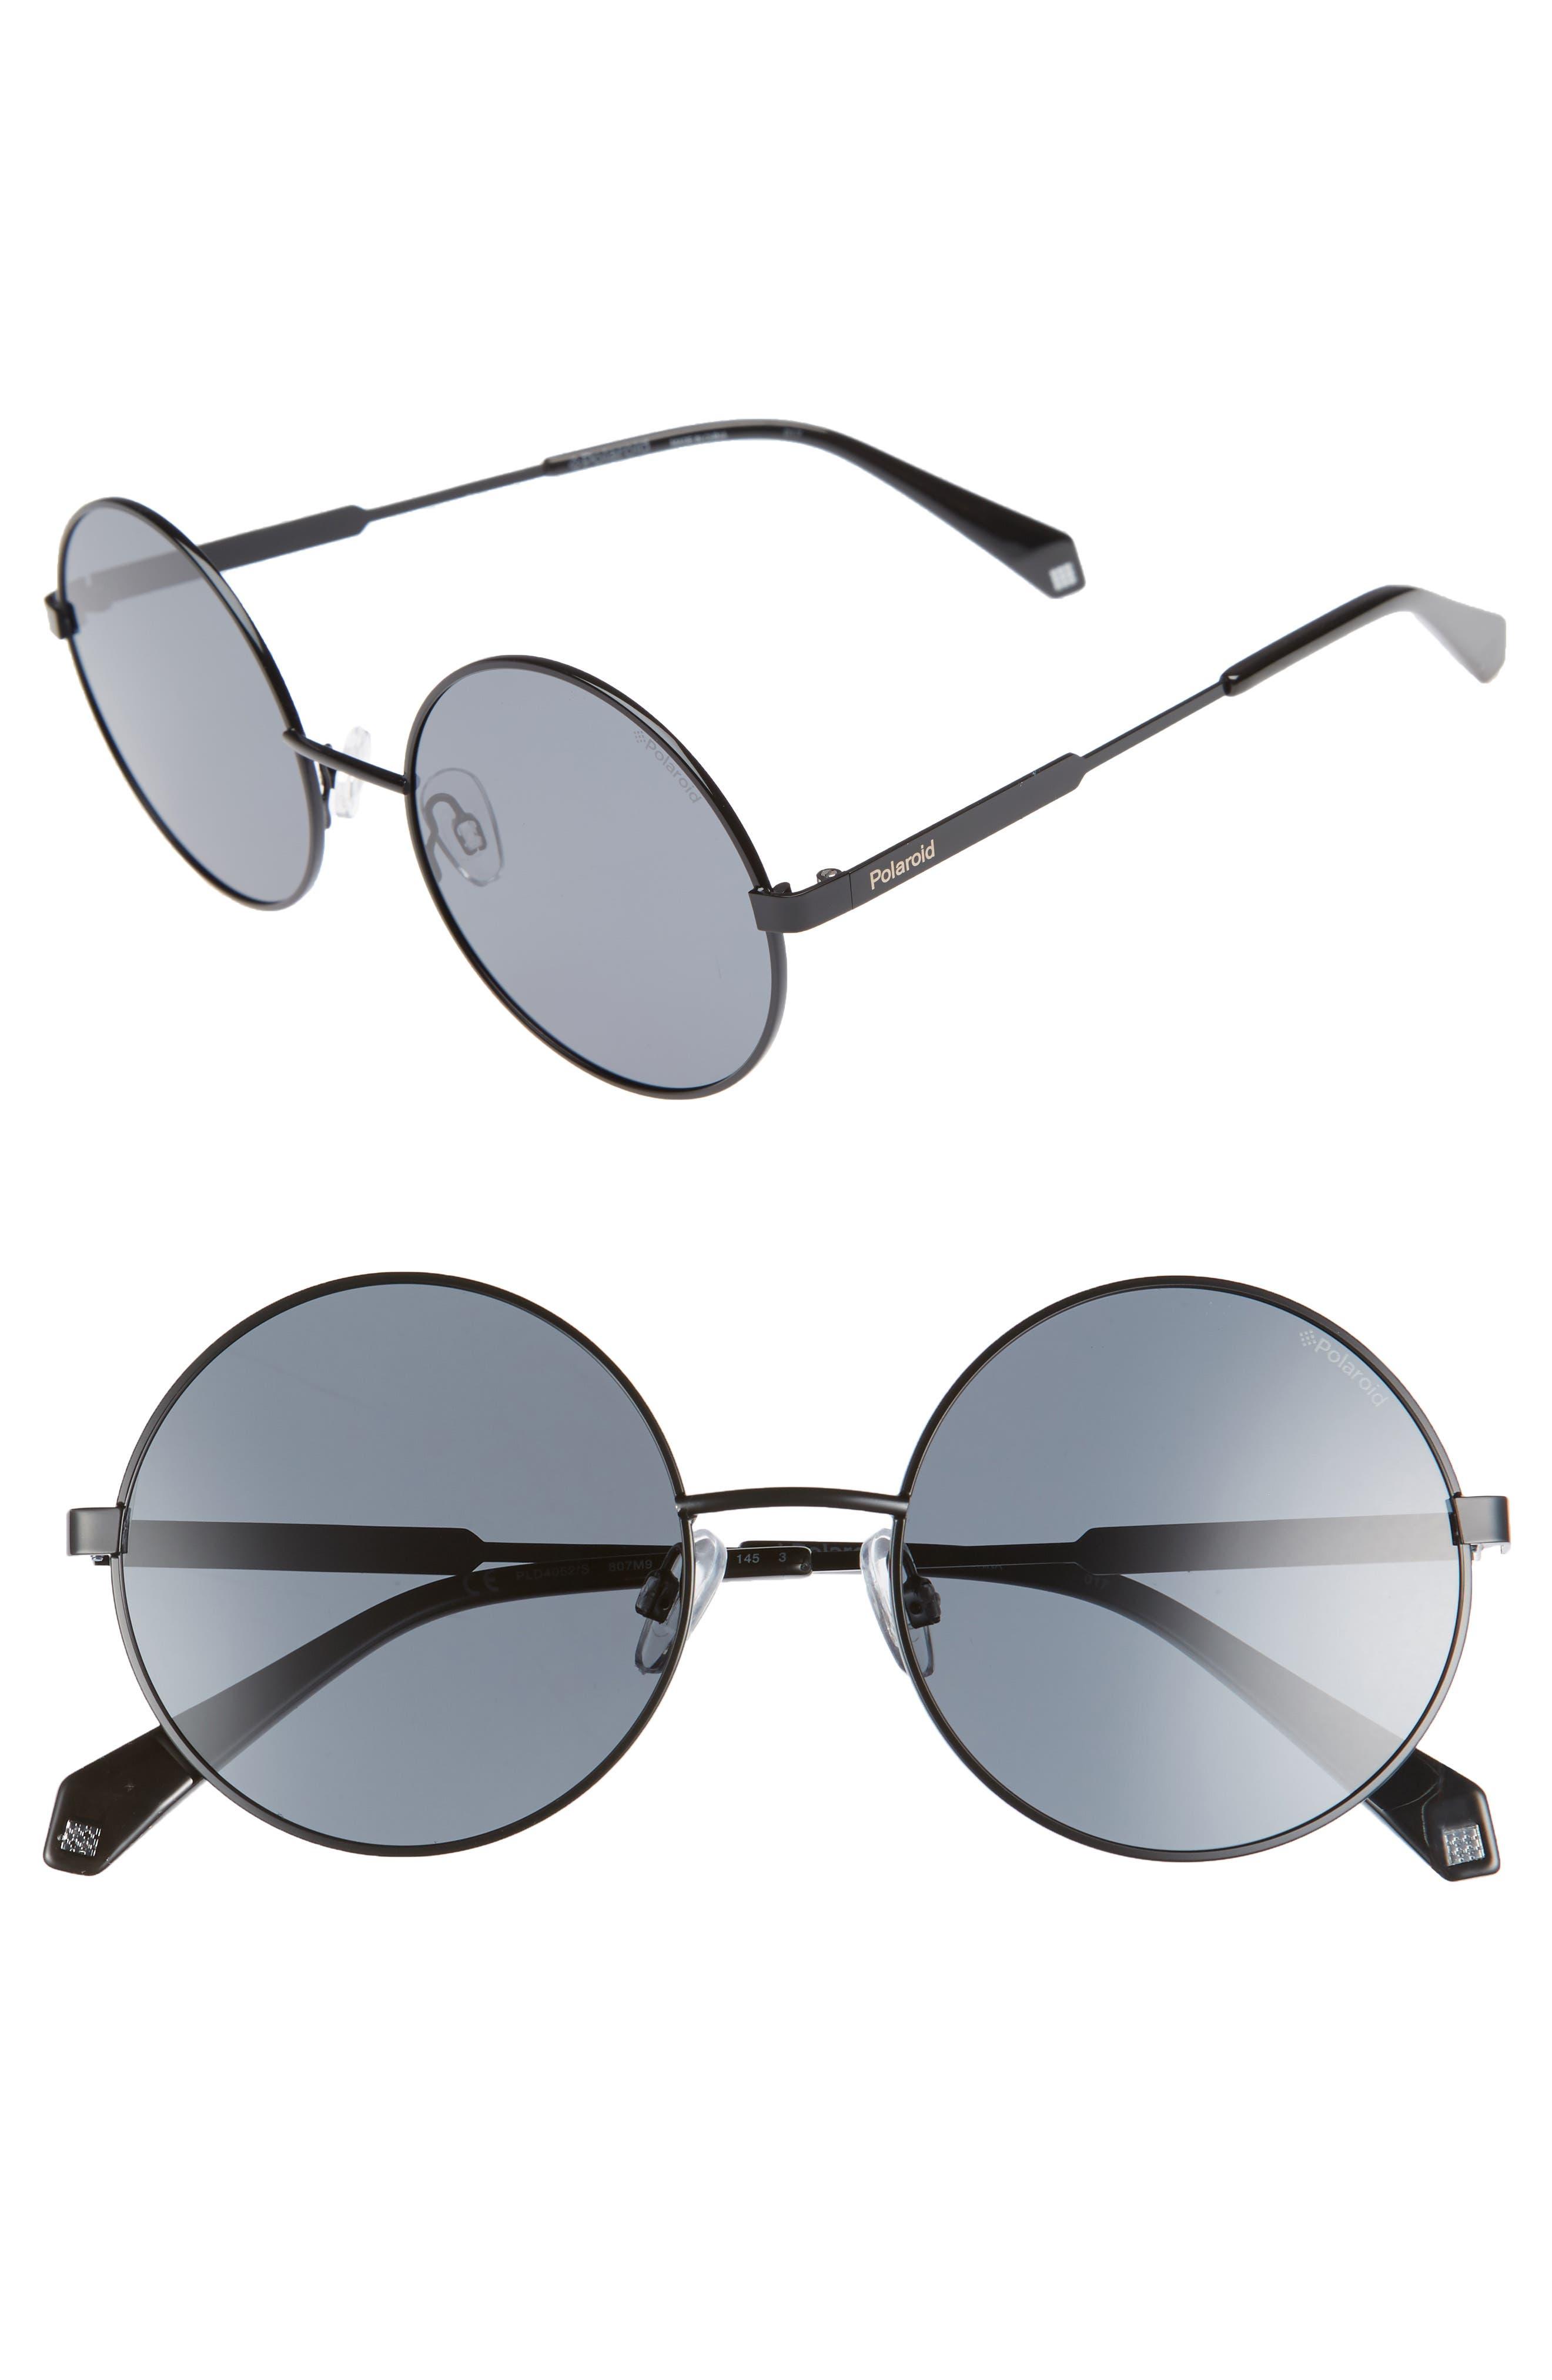 Polaroid 55mm Polarized Round Sunglasses